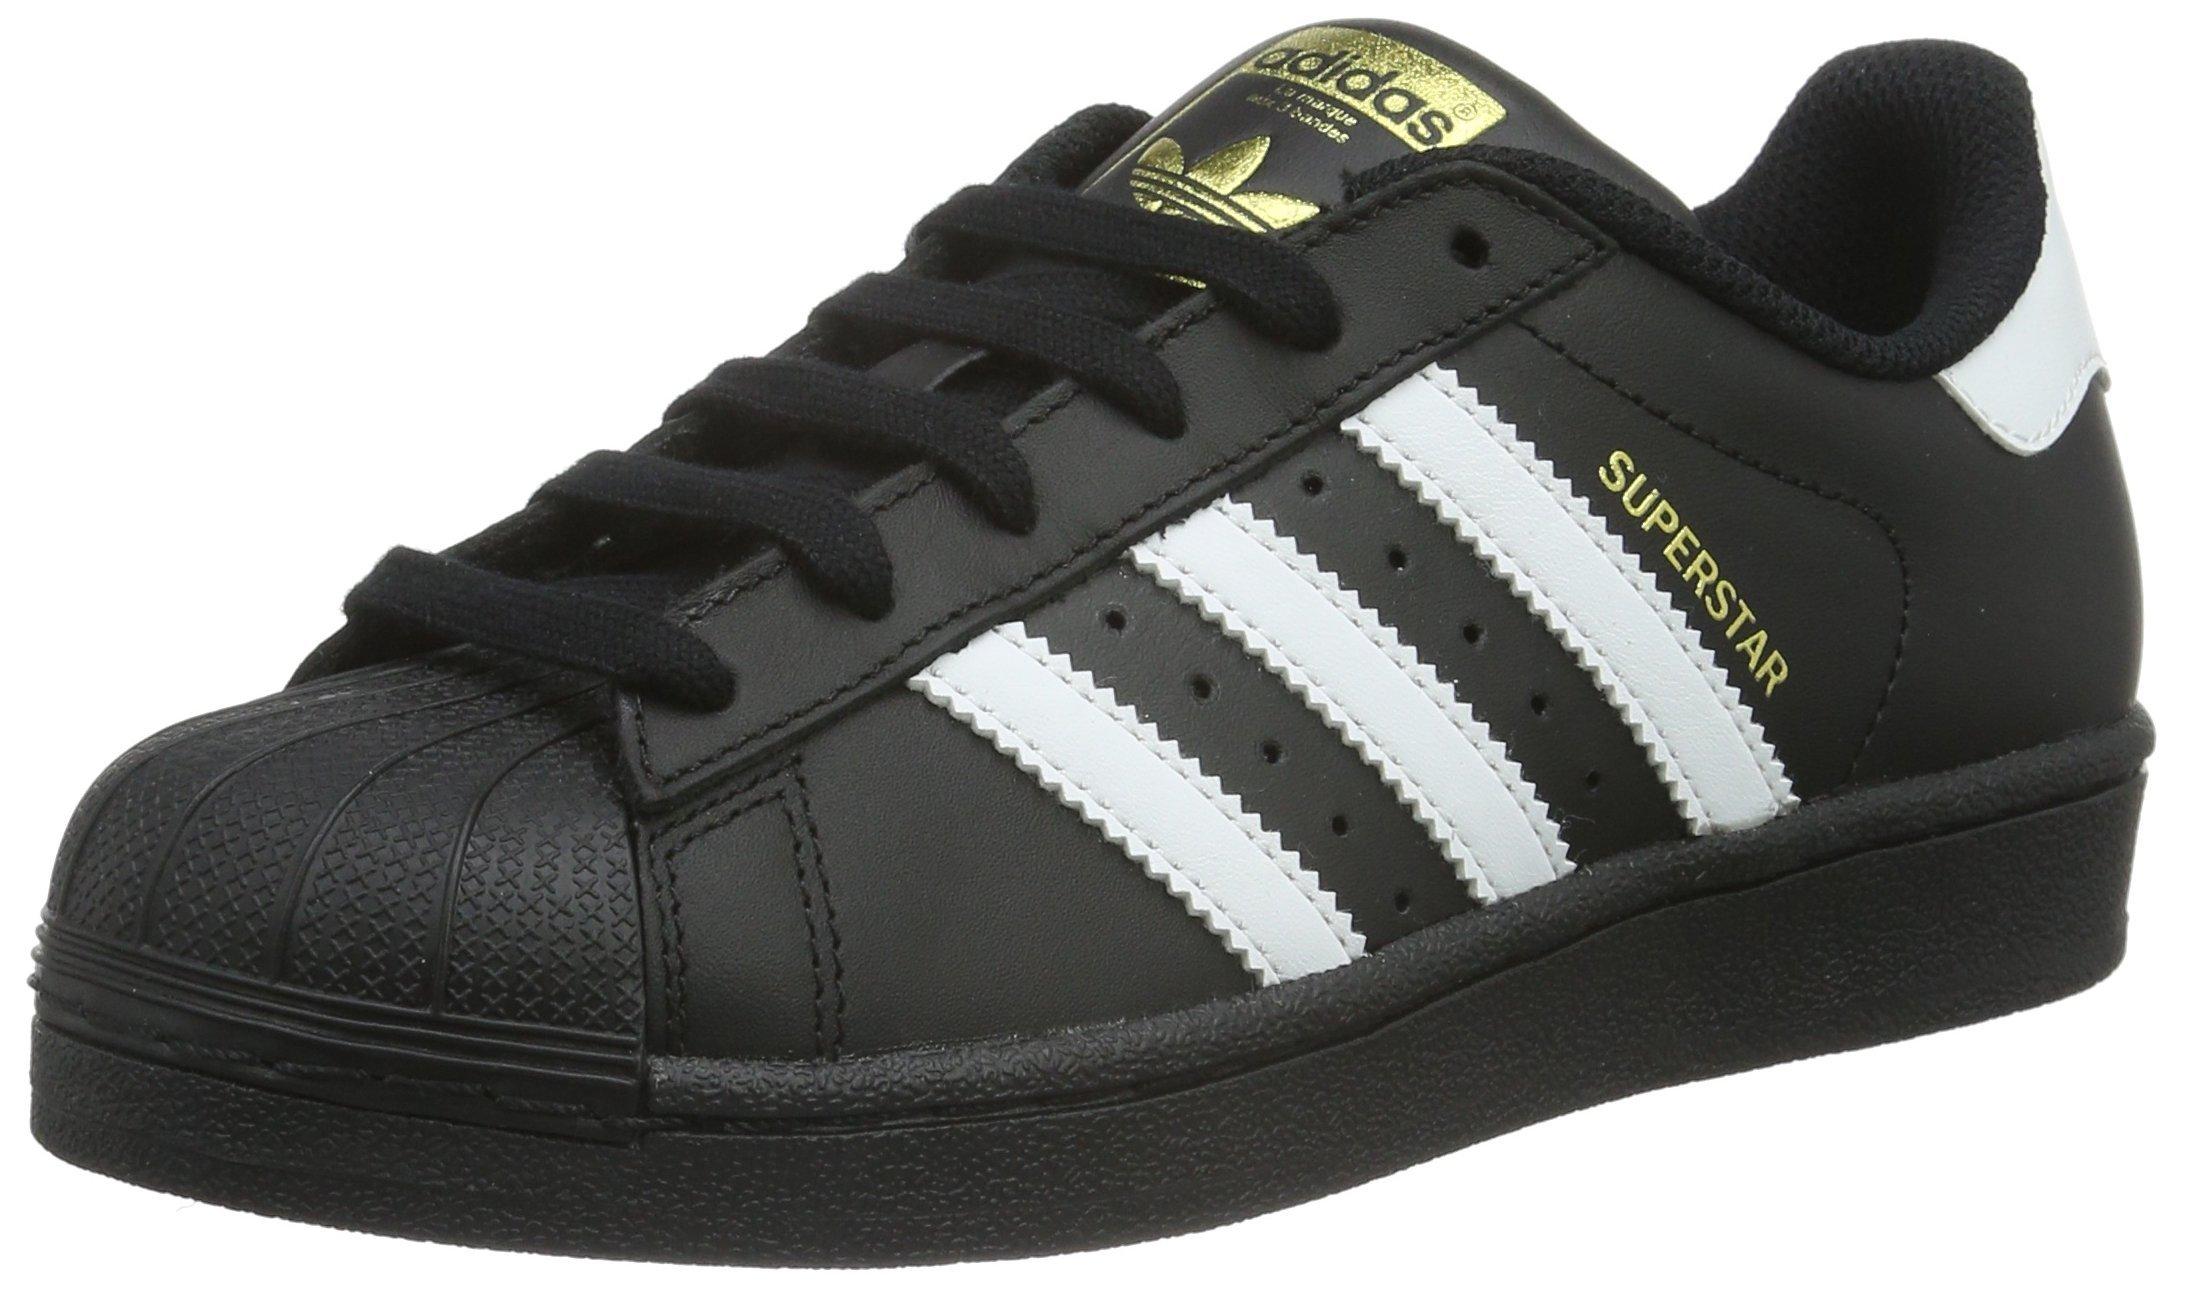 size 40 cbeab 6deb3 adidas Originals Superstar BB2872, Sneakers Unisex - Bambini product image